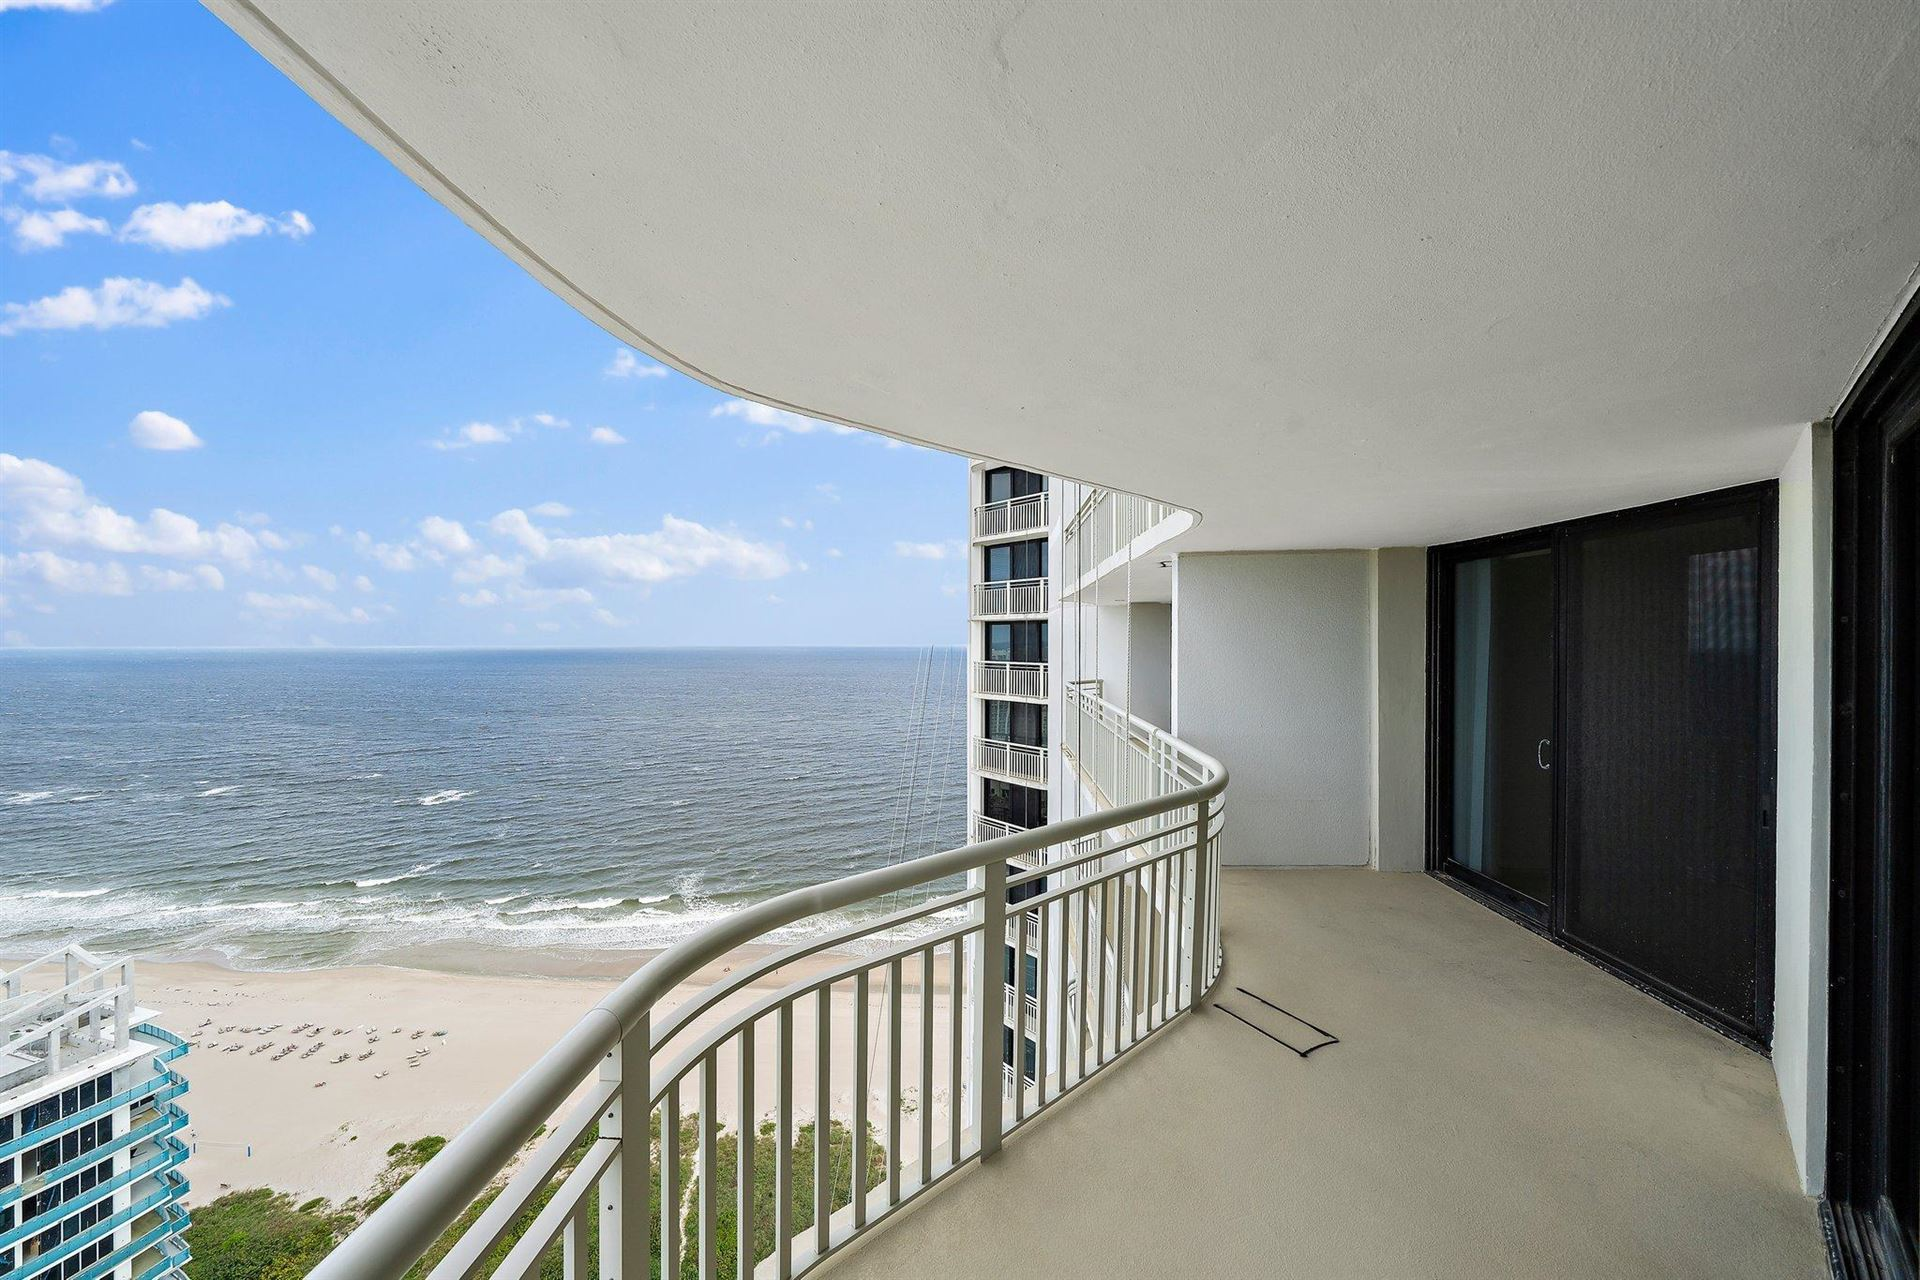 Photo of 3000 N Ocean Drive #38a, Singer Island, FL 33404 (MLS # RX-10672397)